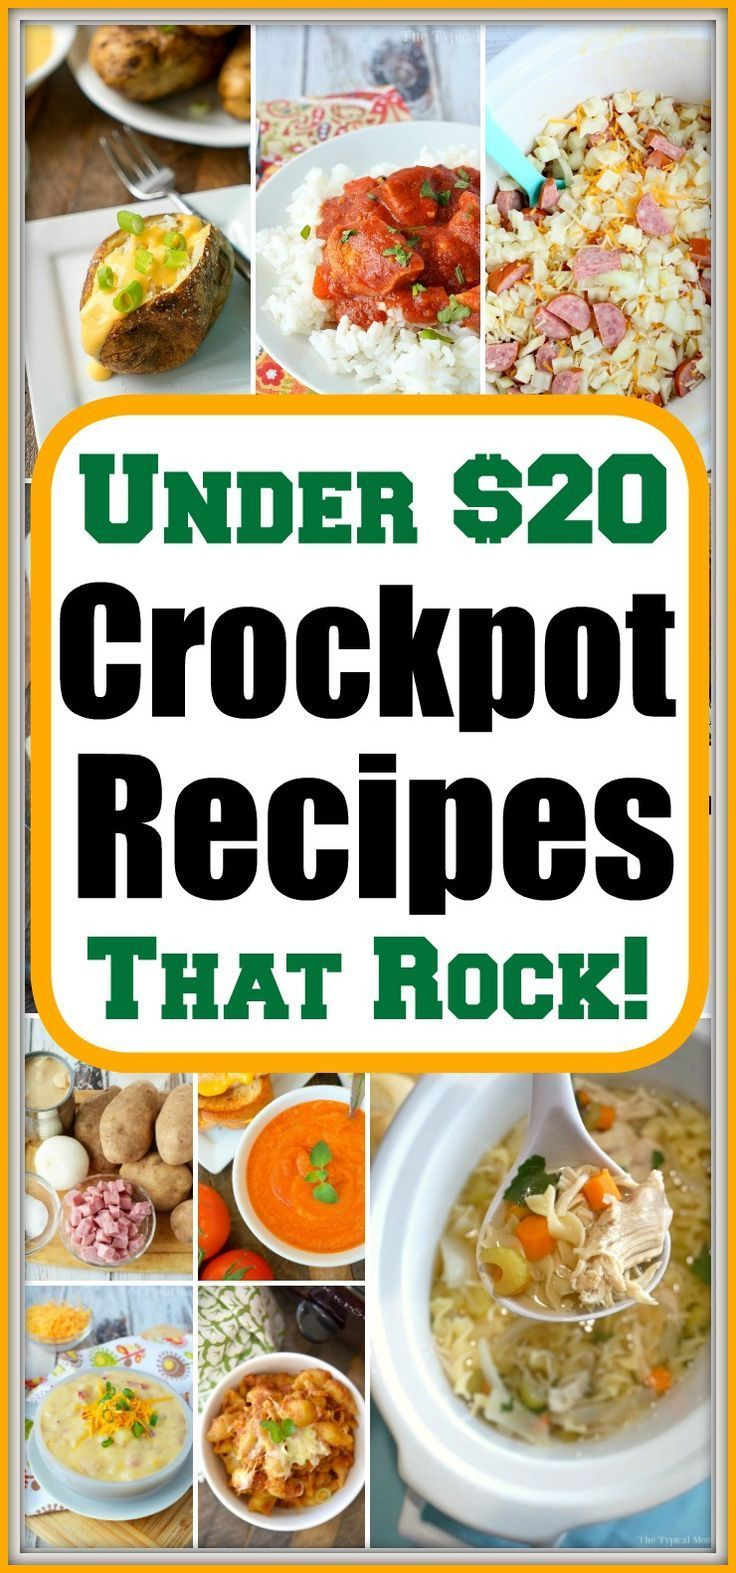 Easy Cheap Crockpot Meals Under 20 Bucks Easy Crockpot Dinners Crockpot Recipes Crockpot Dinner